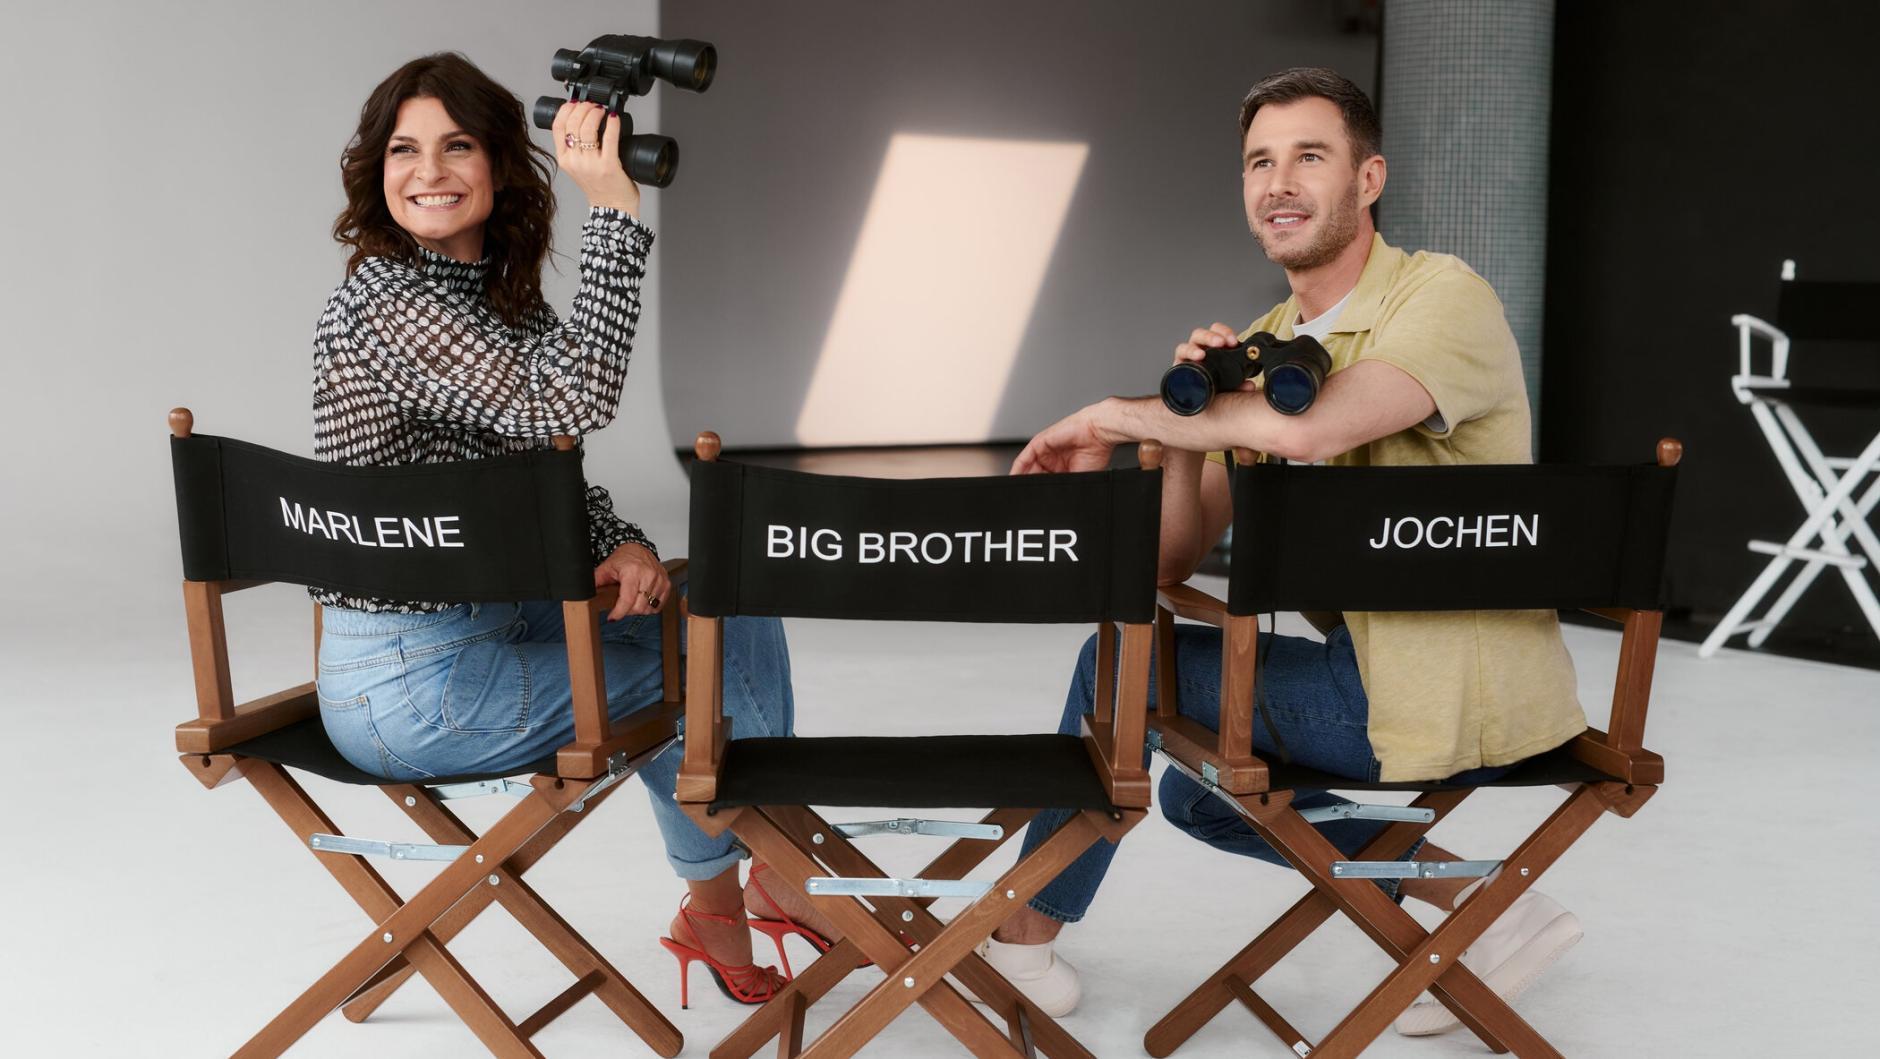 Promi Big Brother 2021: Übertragung im TV & Live-Stream